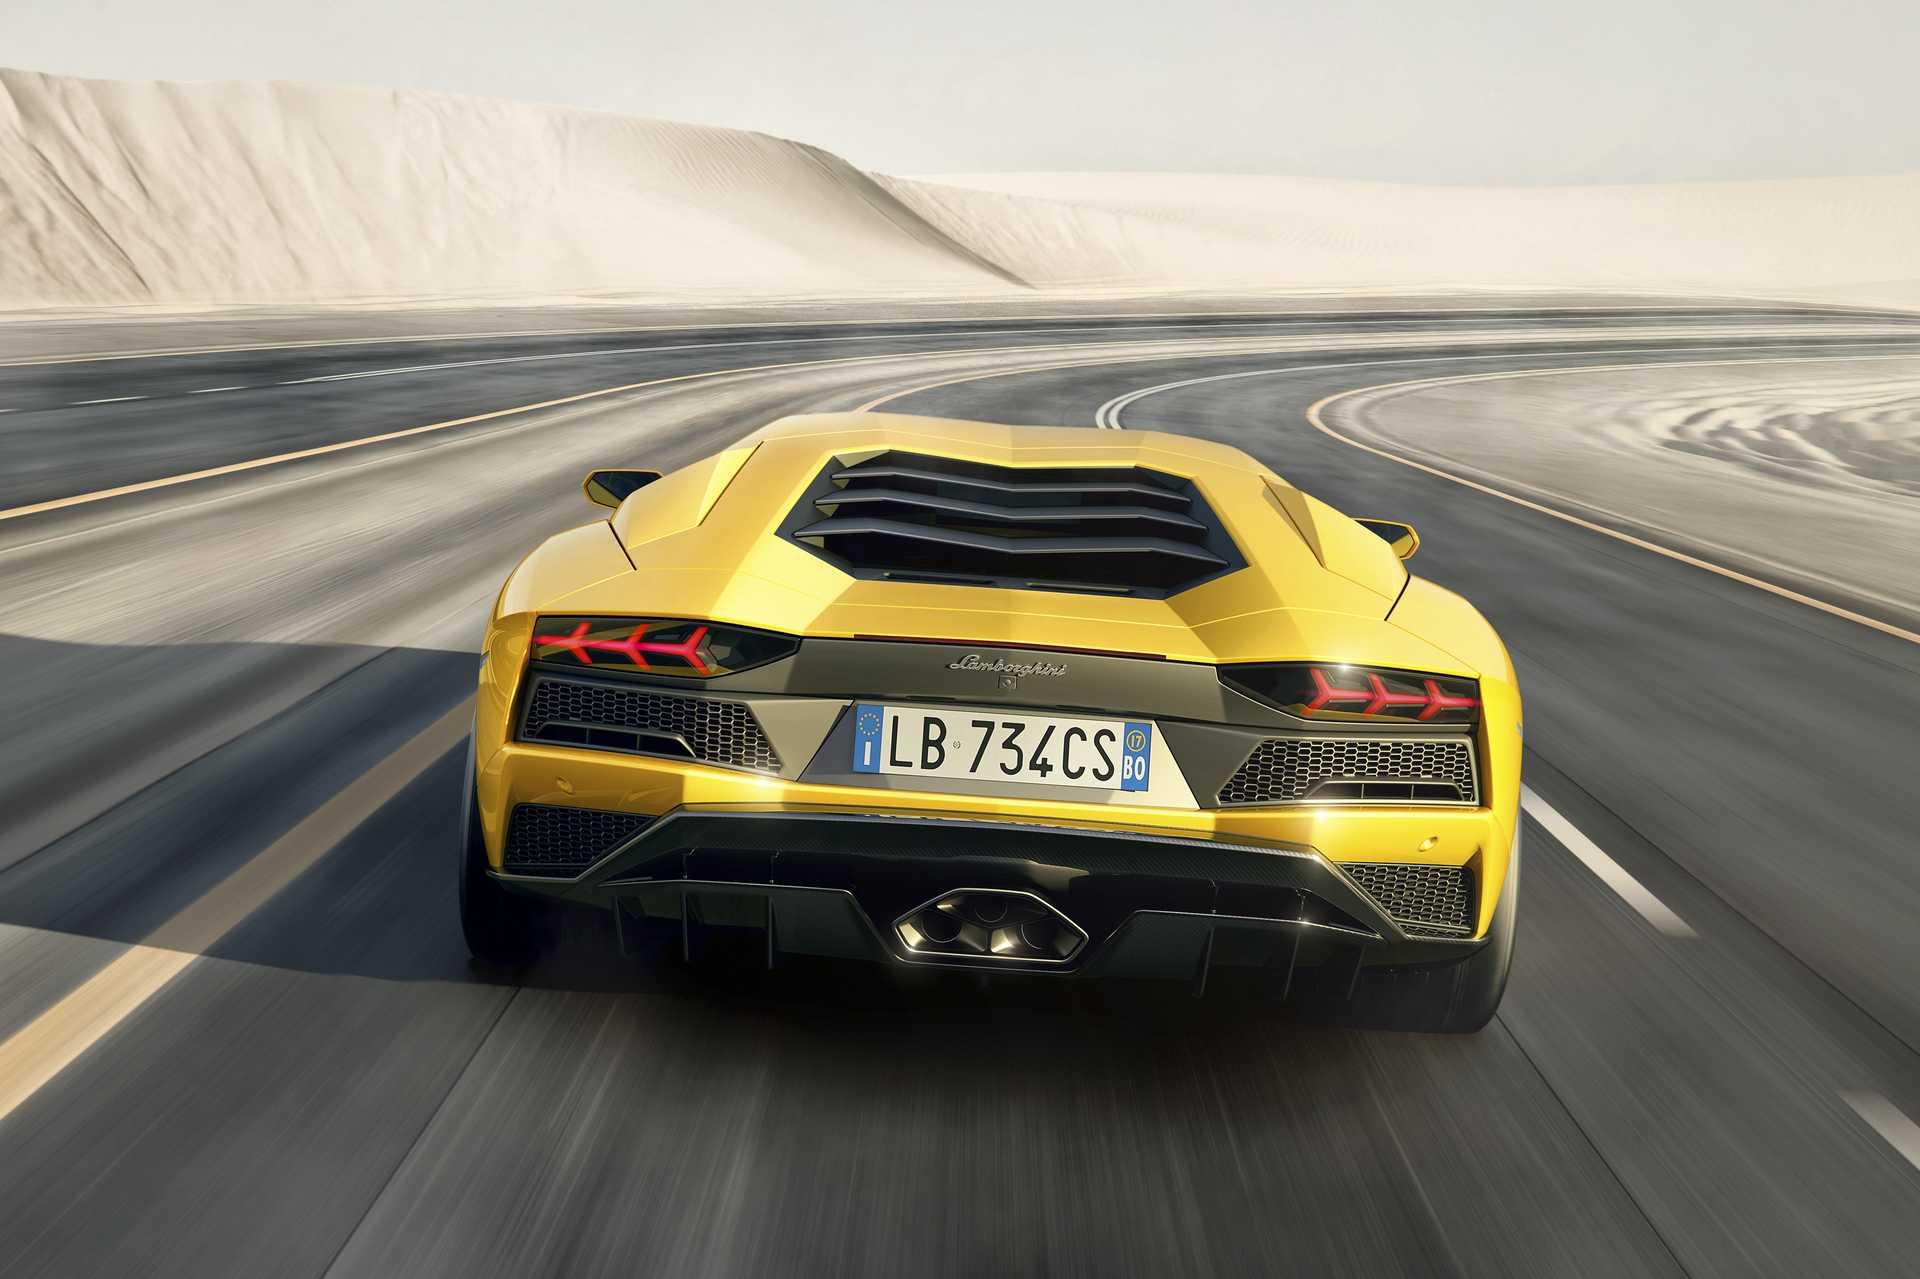 Lamborghini Aventador 1st Generation